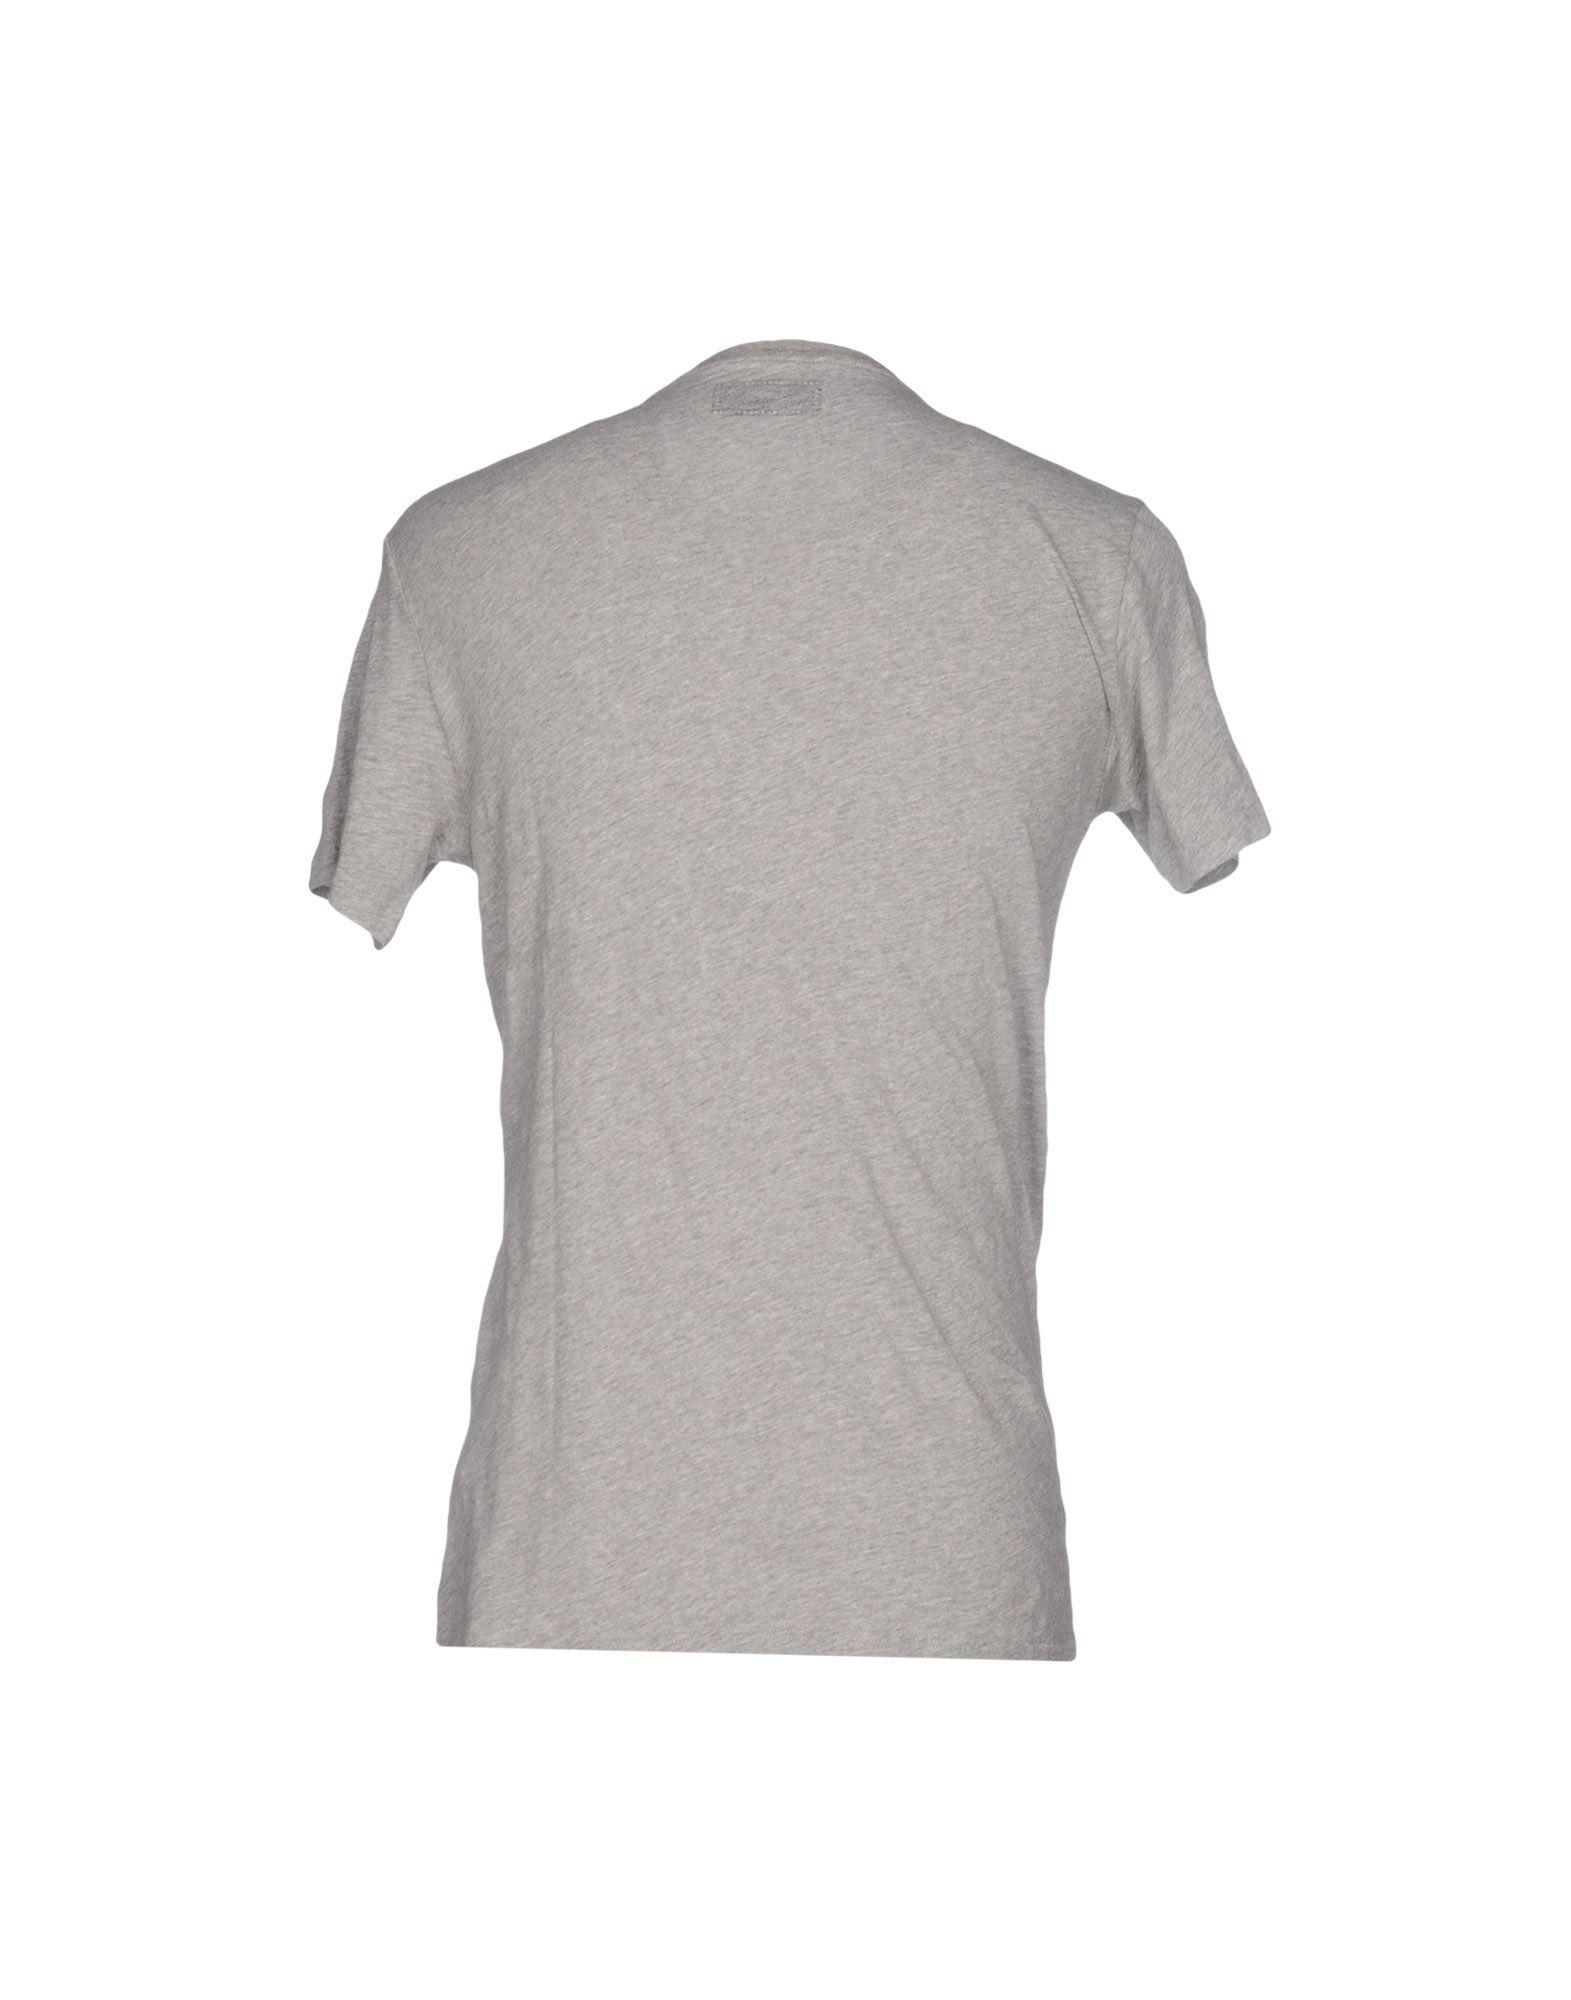 T-Shirt Vintage 55 Uomo Uomo Uomo - 37942628JA 4aaddf